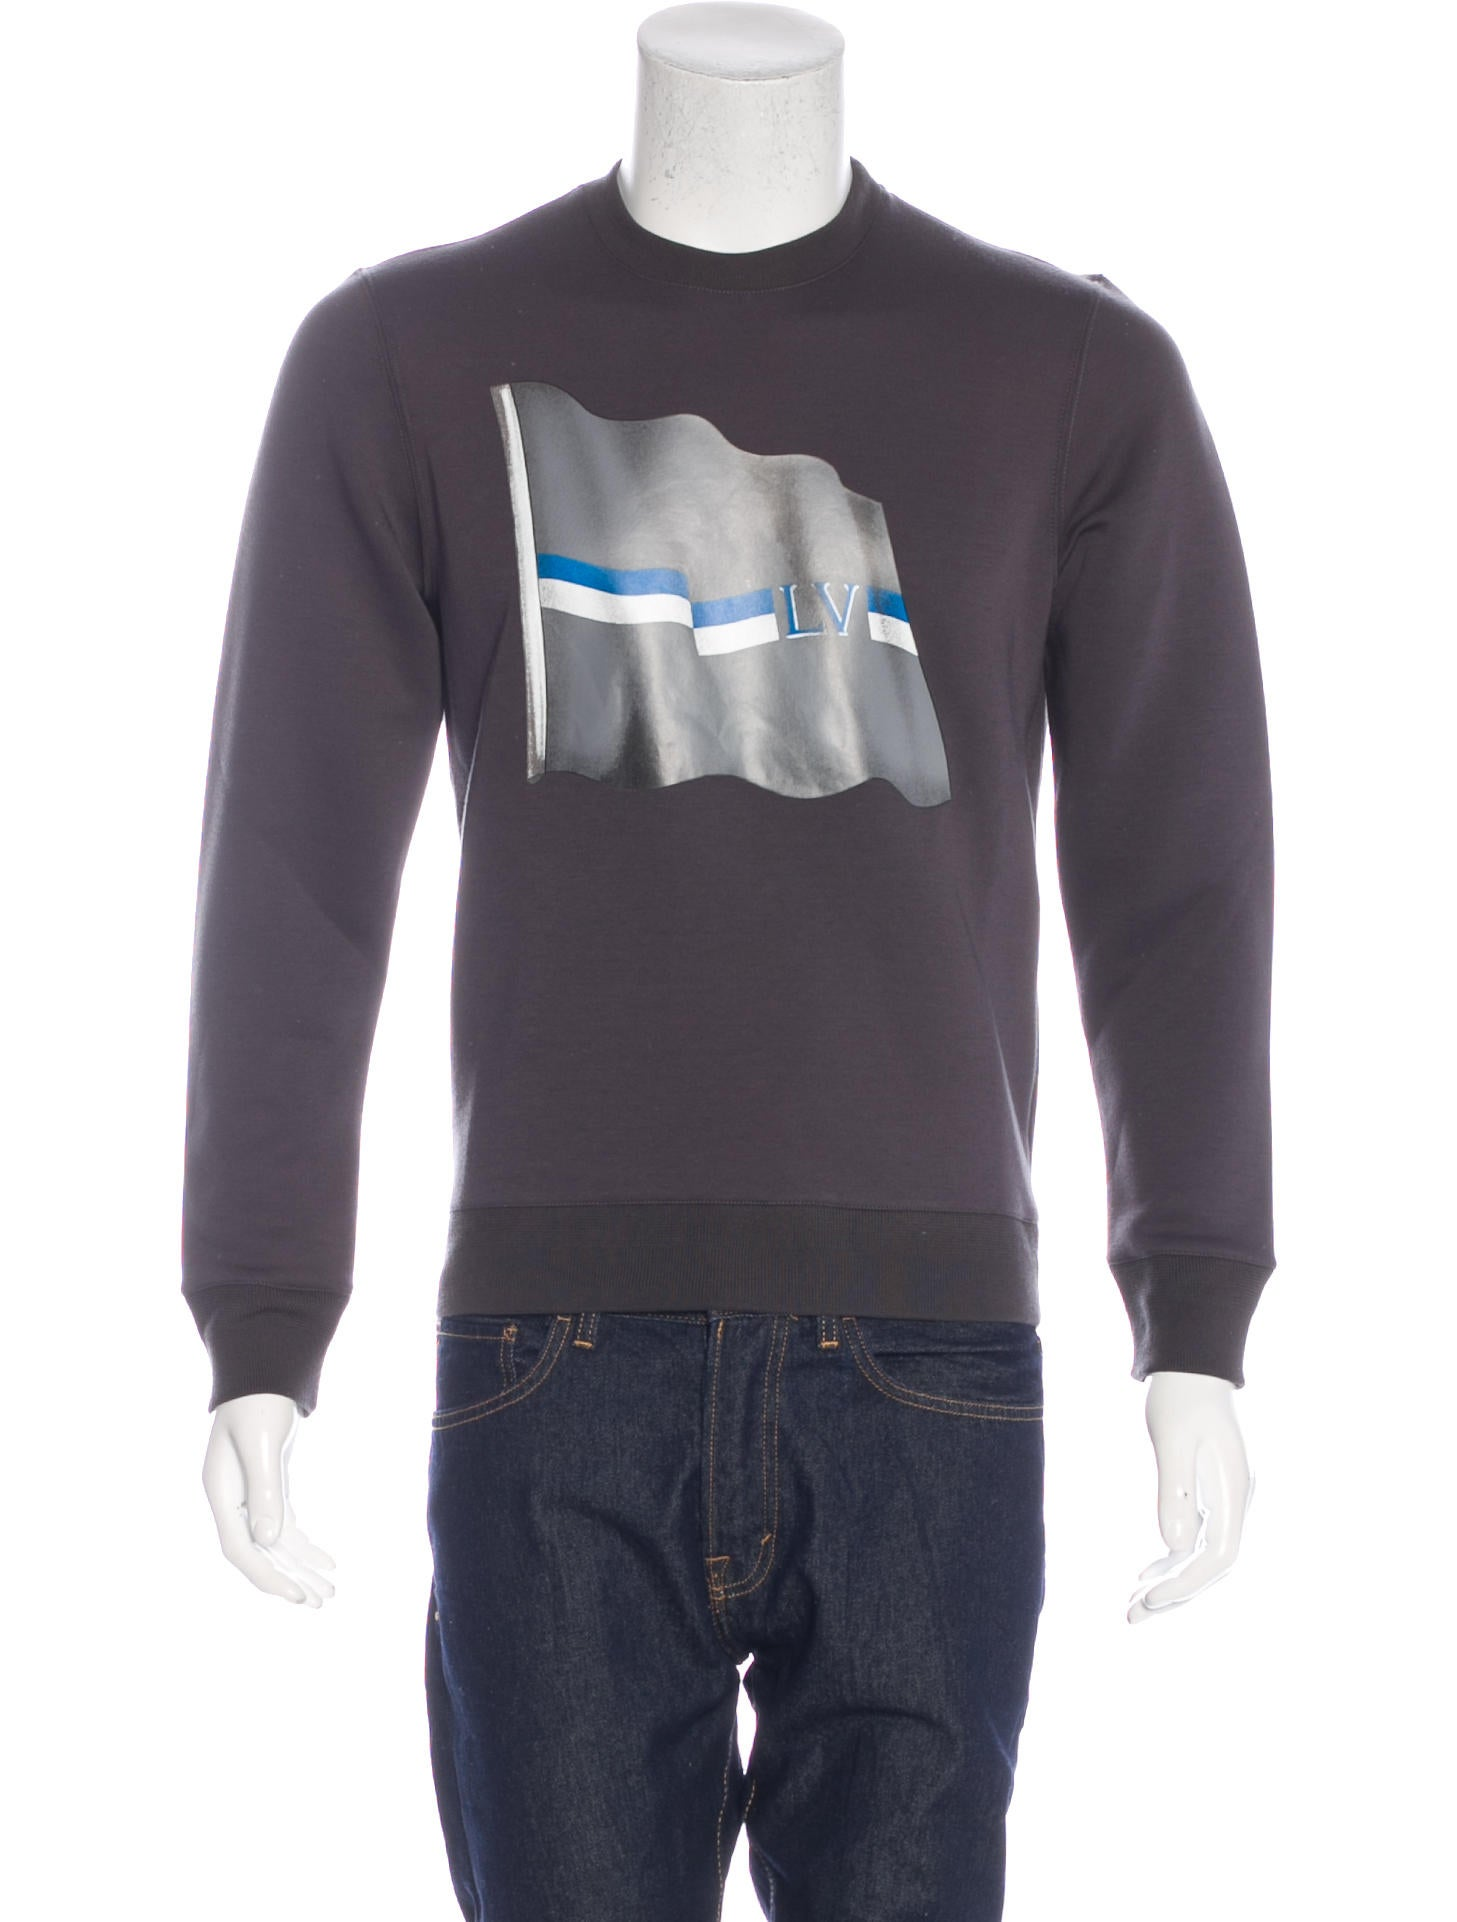 Louis vuitton hoodies